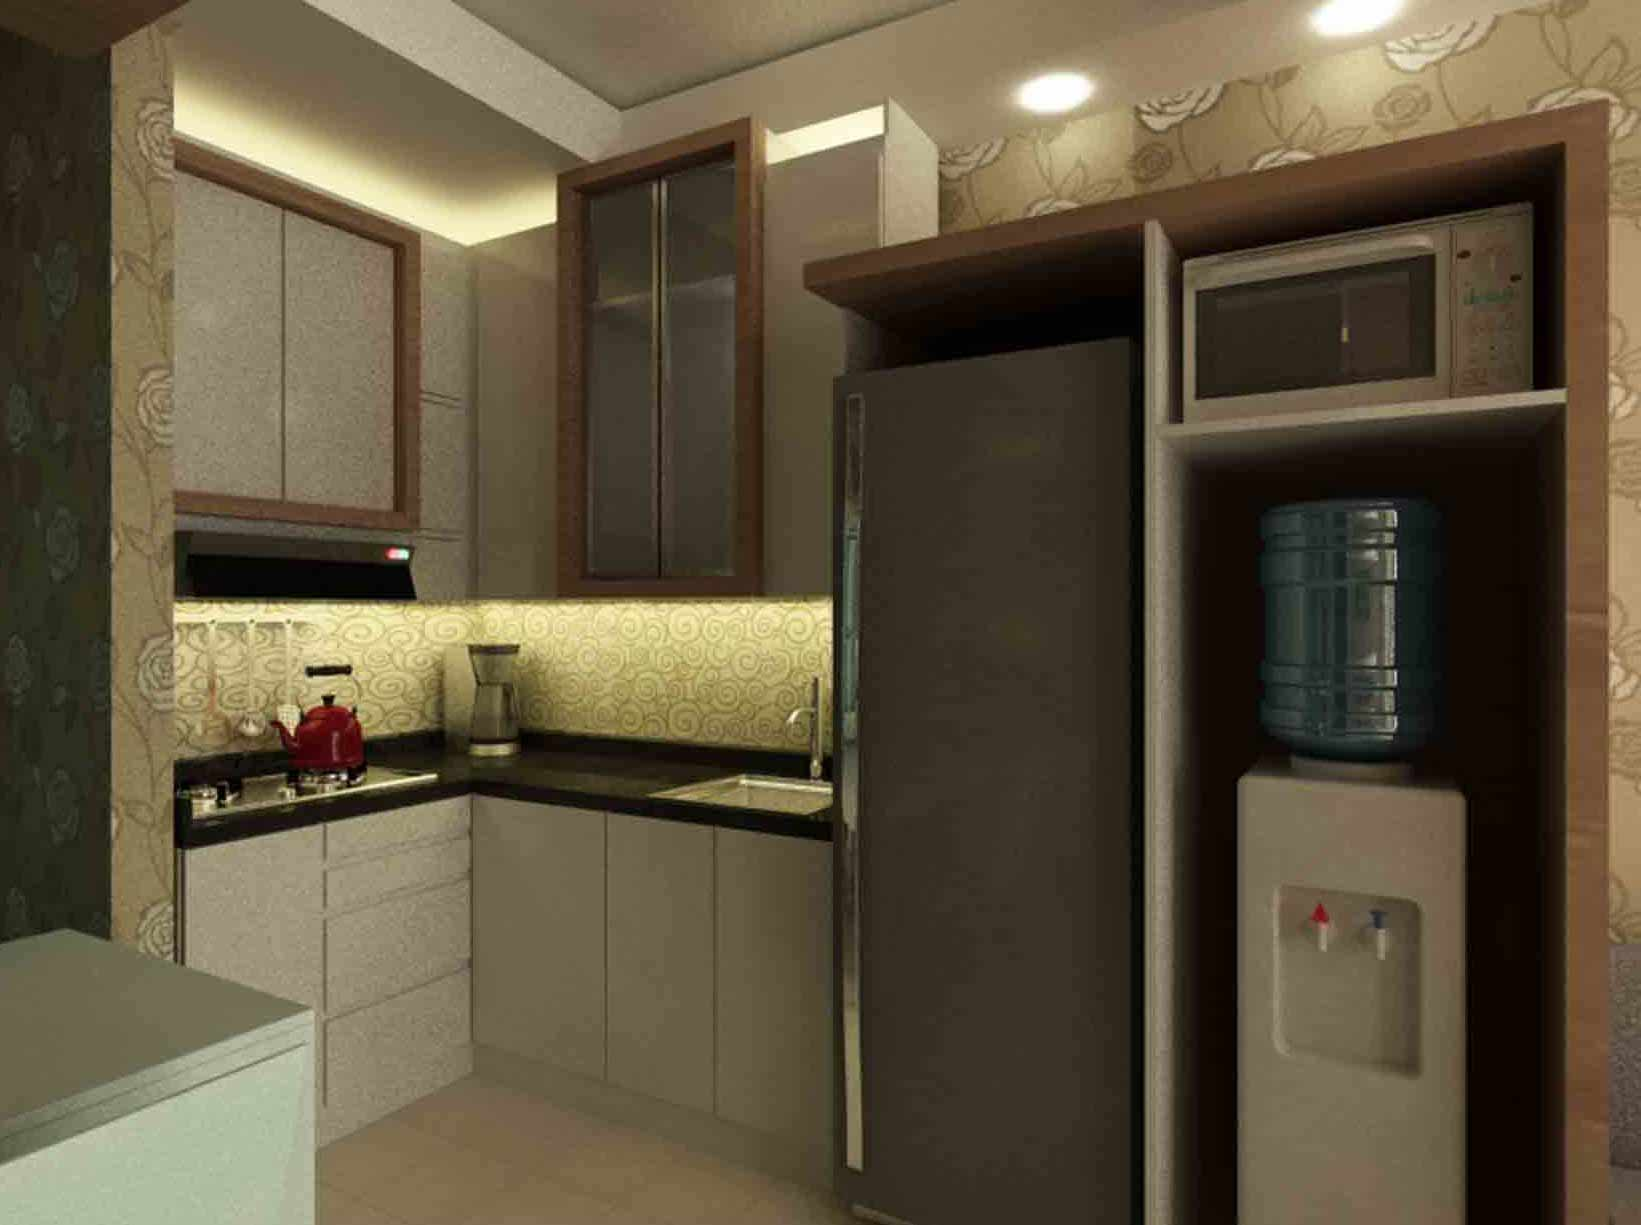 Apartment Kitchen Set Homesfeed